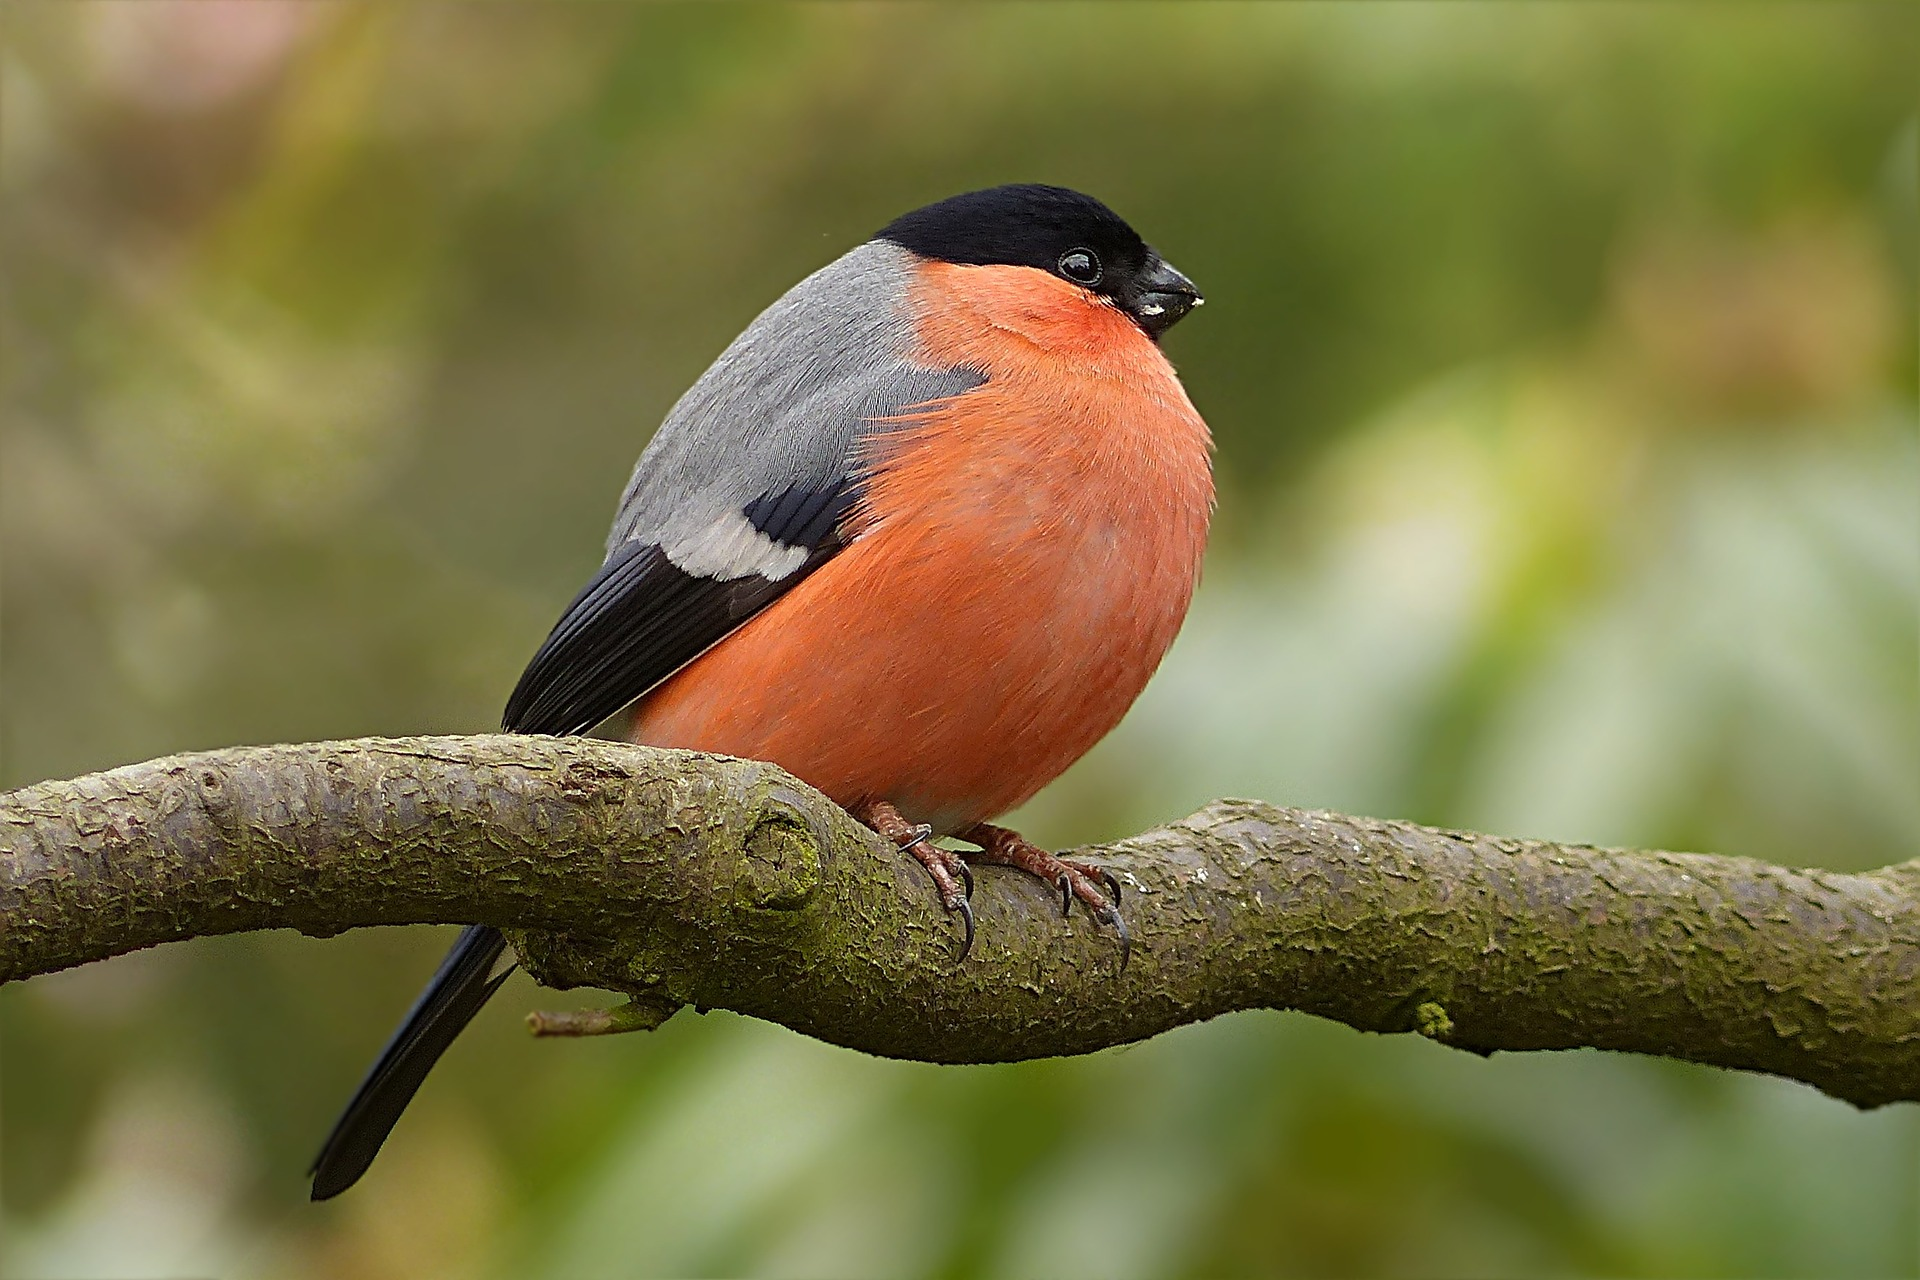 bull finch - how do birds stay warm